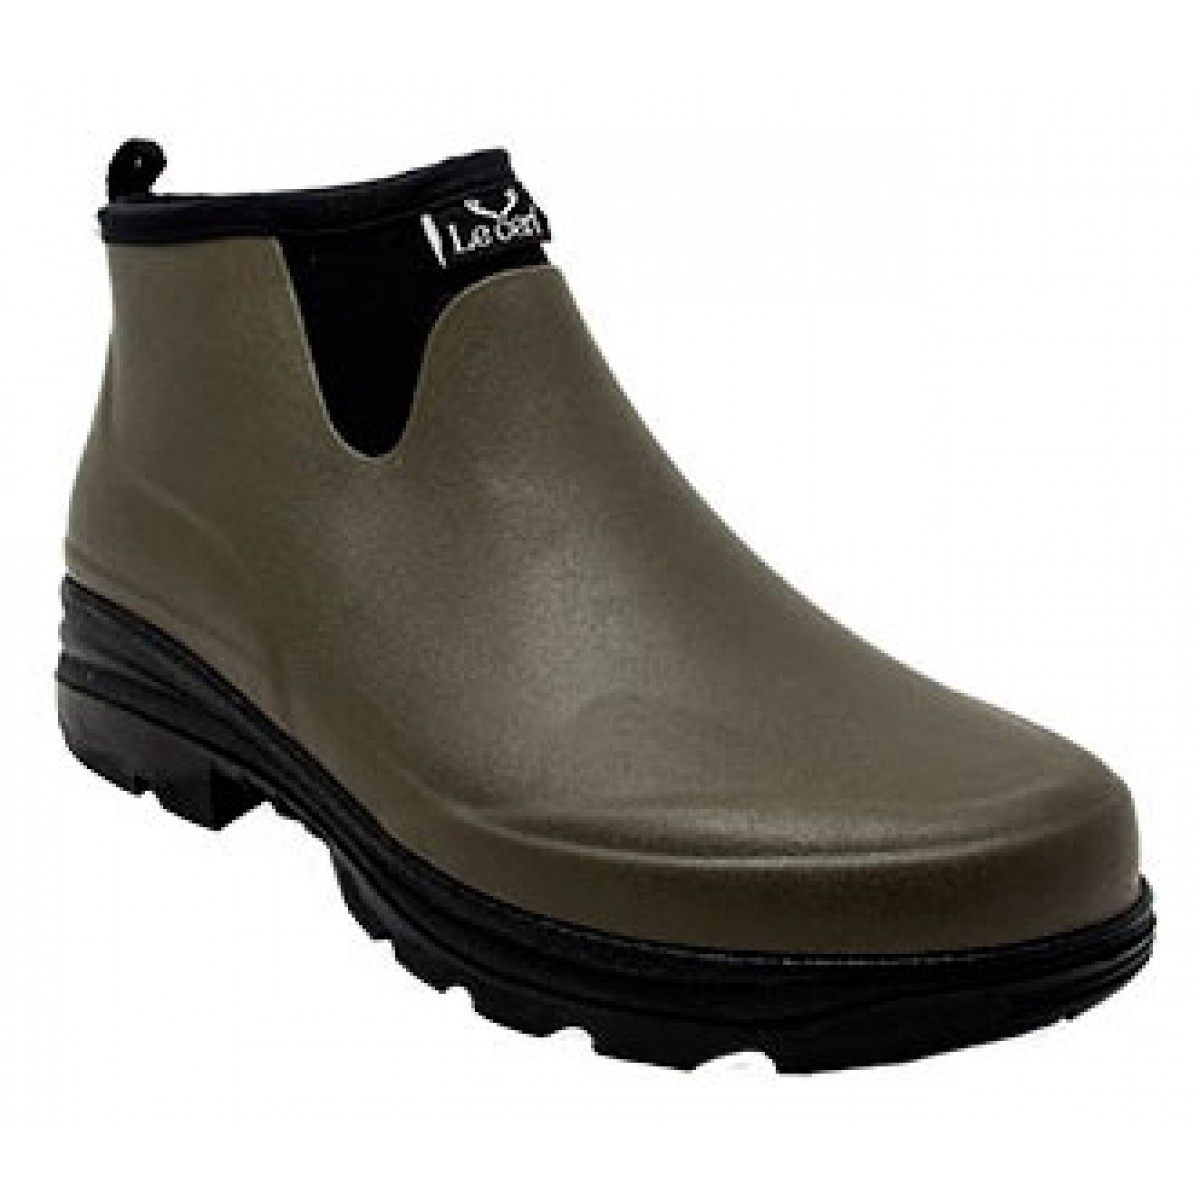 Le Cerf kort gummistøvle-31